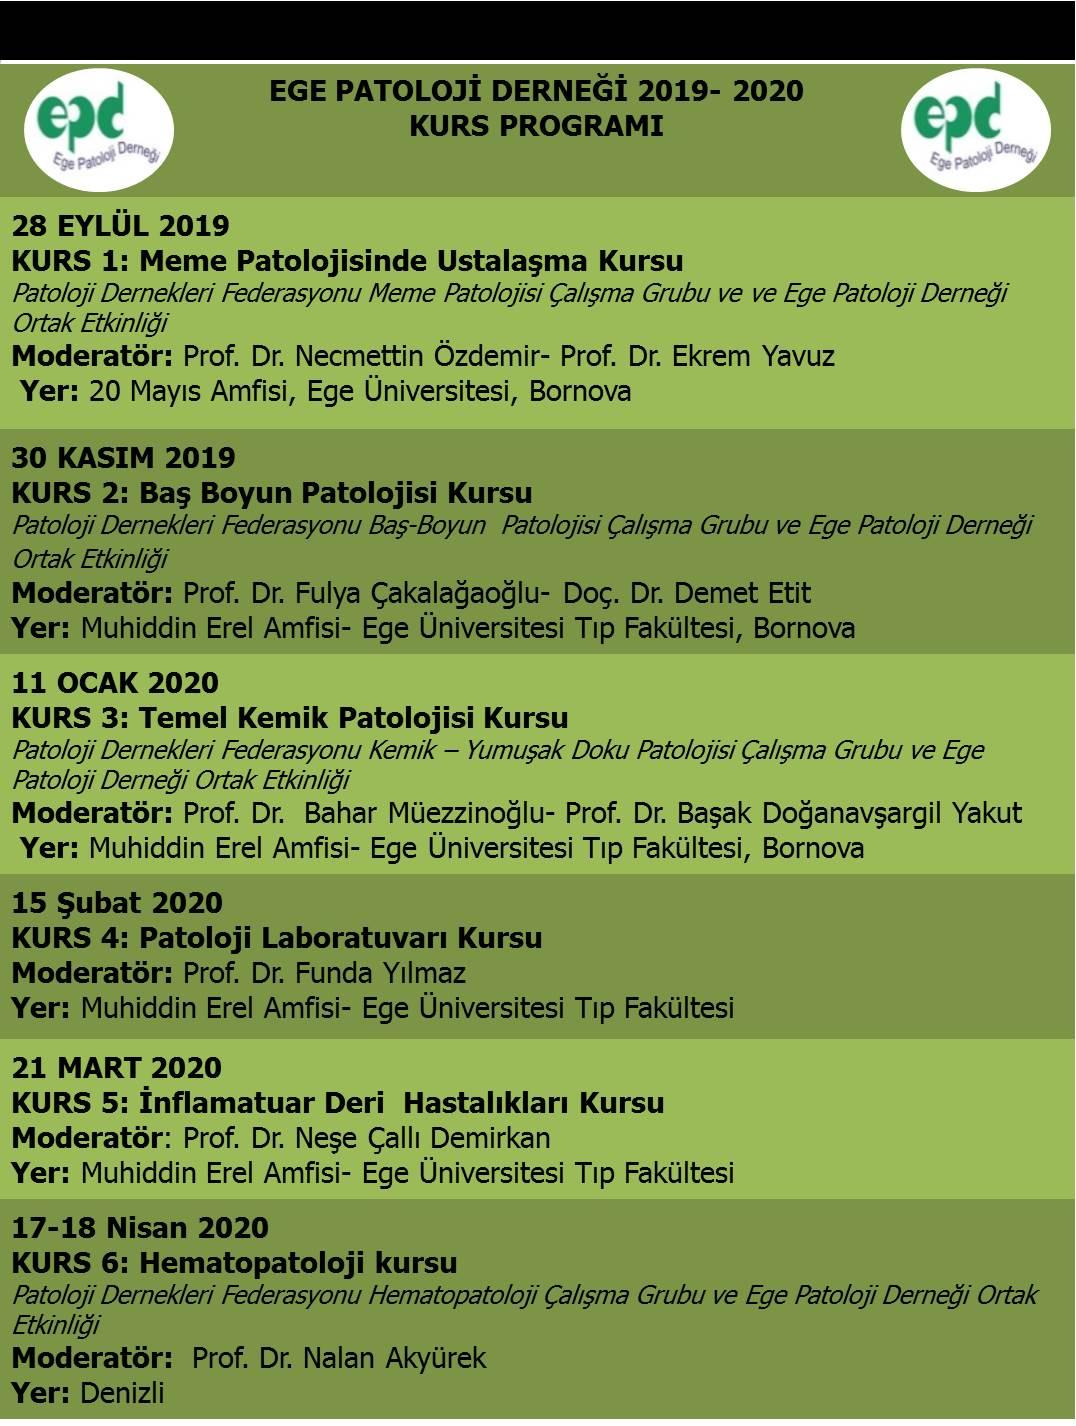 Ege Patoloji Derneği 2019-2020 Kurs Programı-1